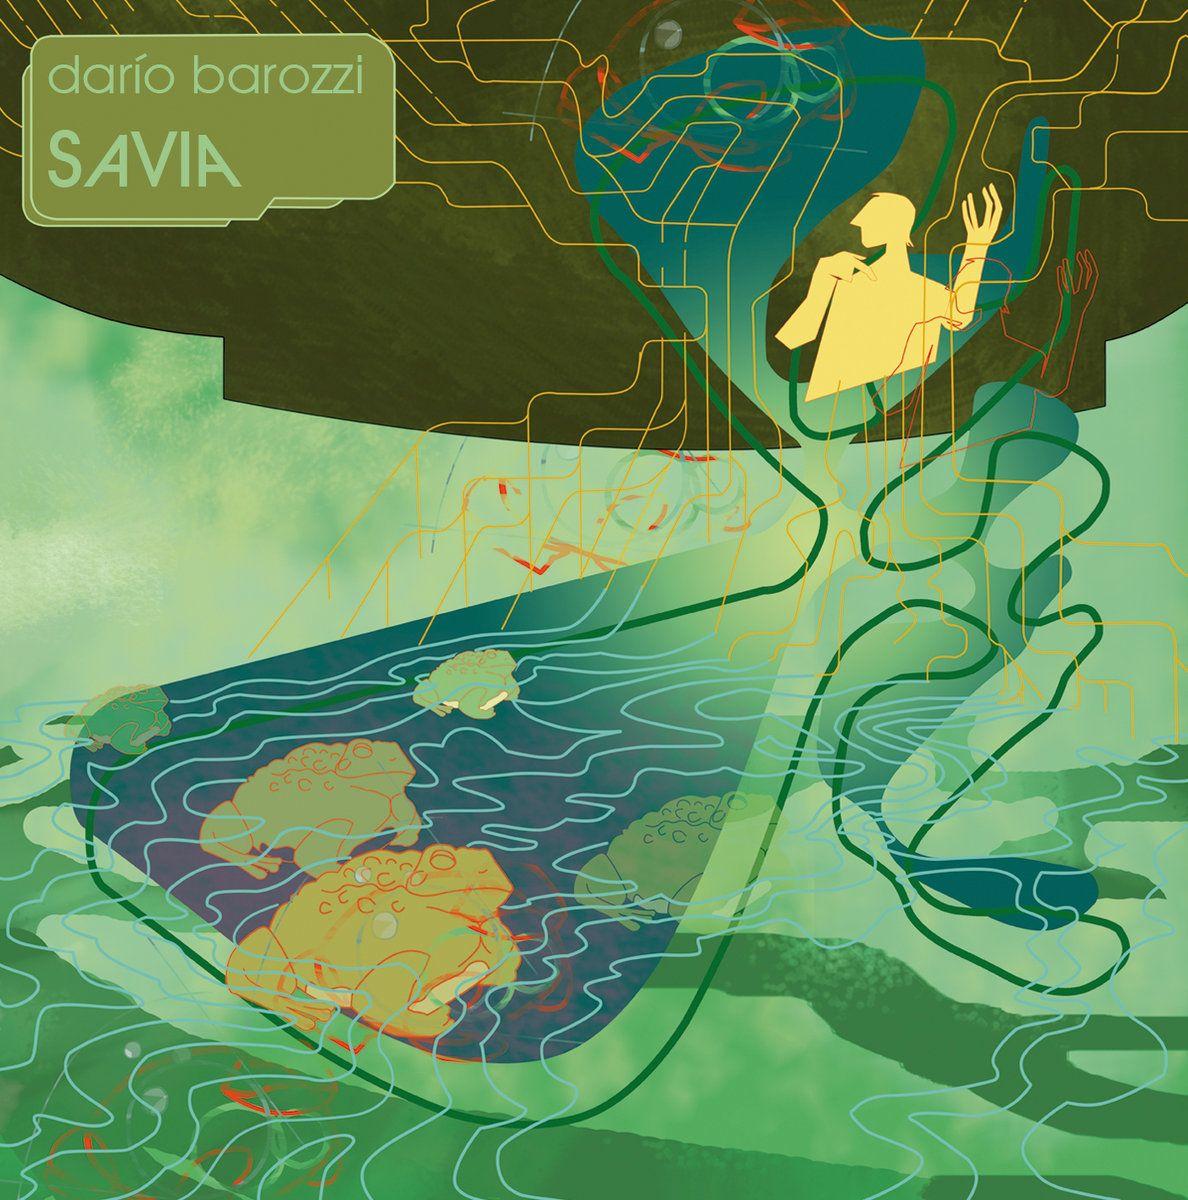 Darío Barozzi presenta Savia, su disco debut